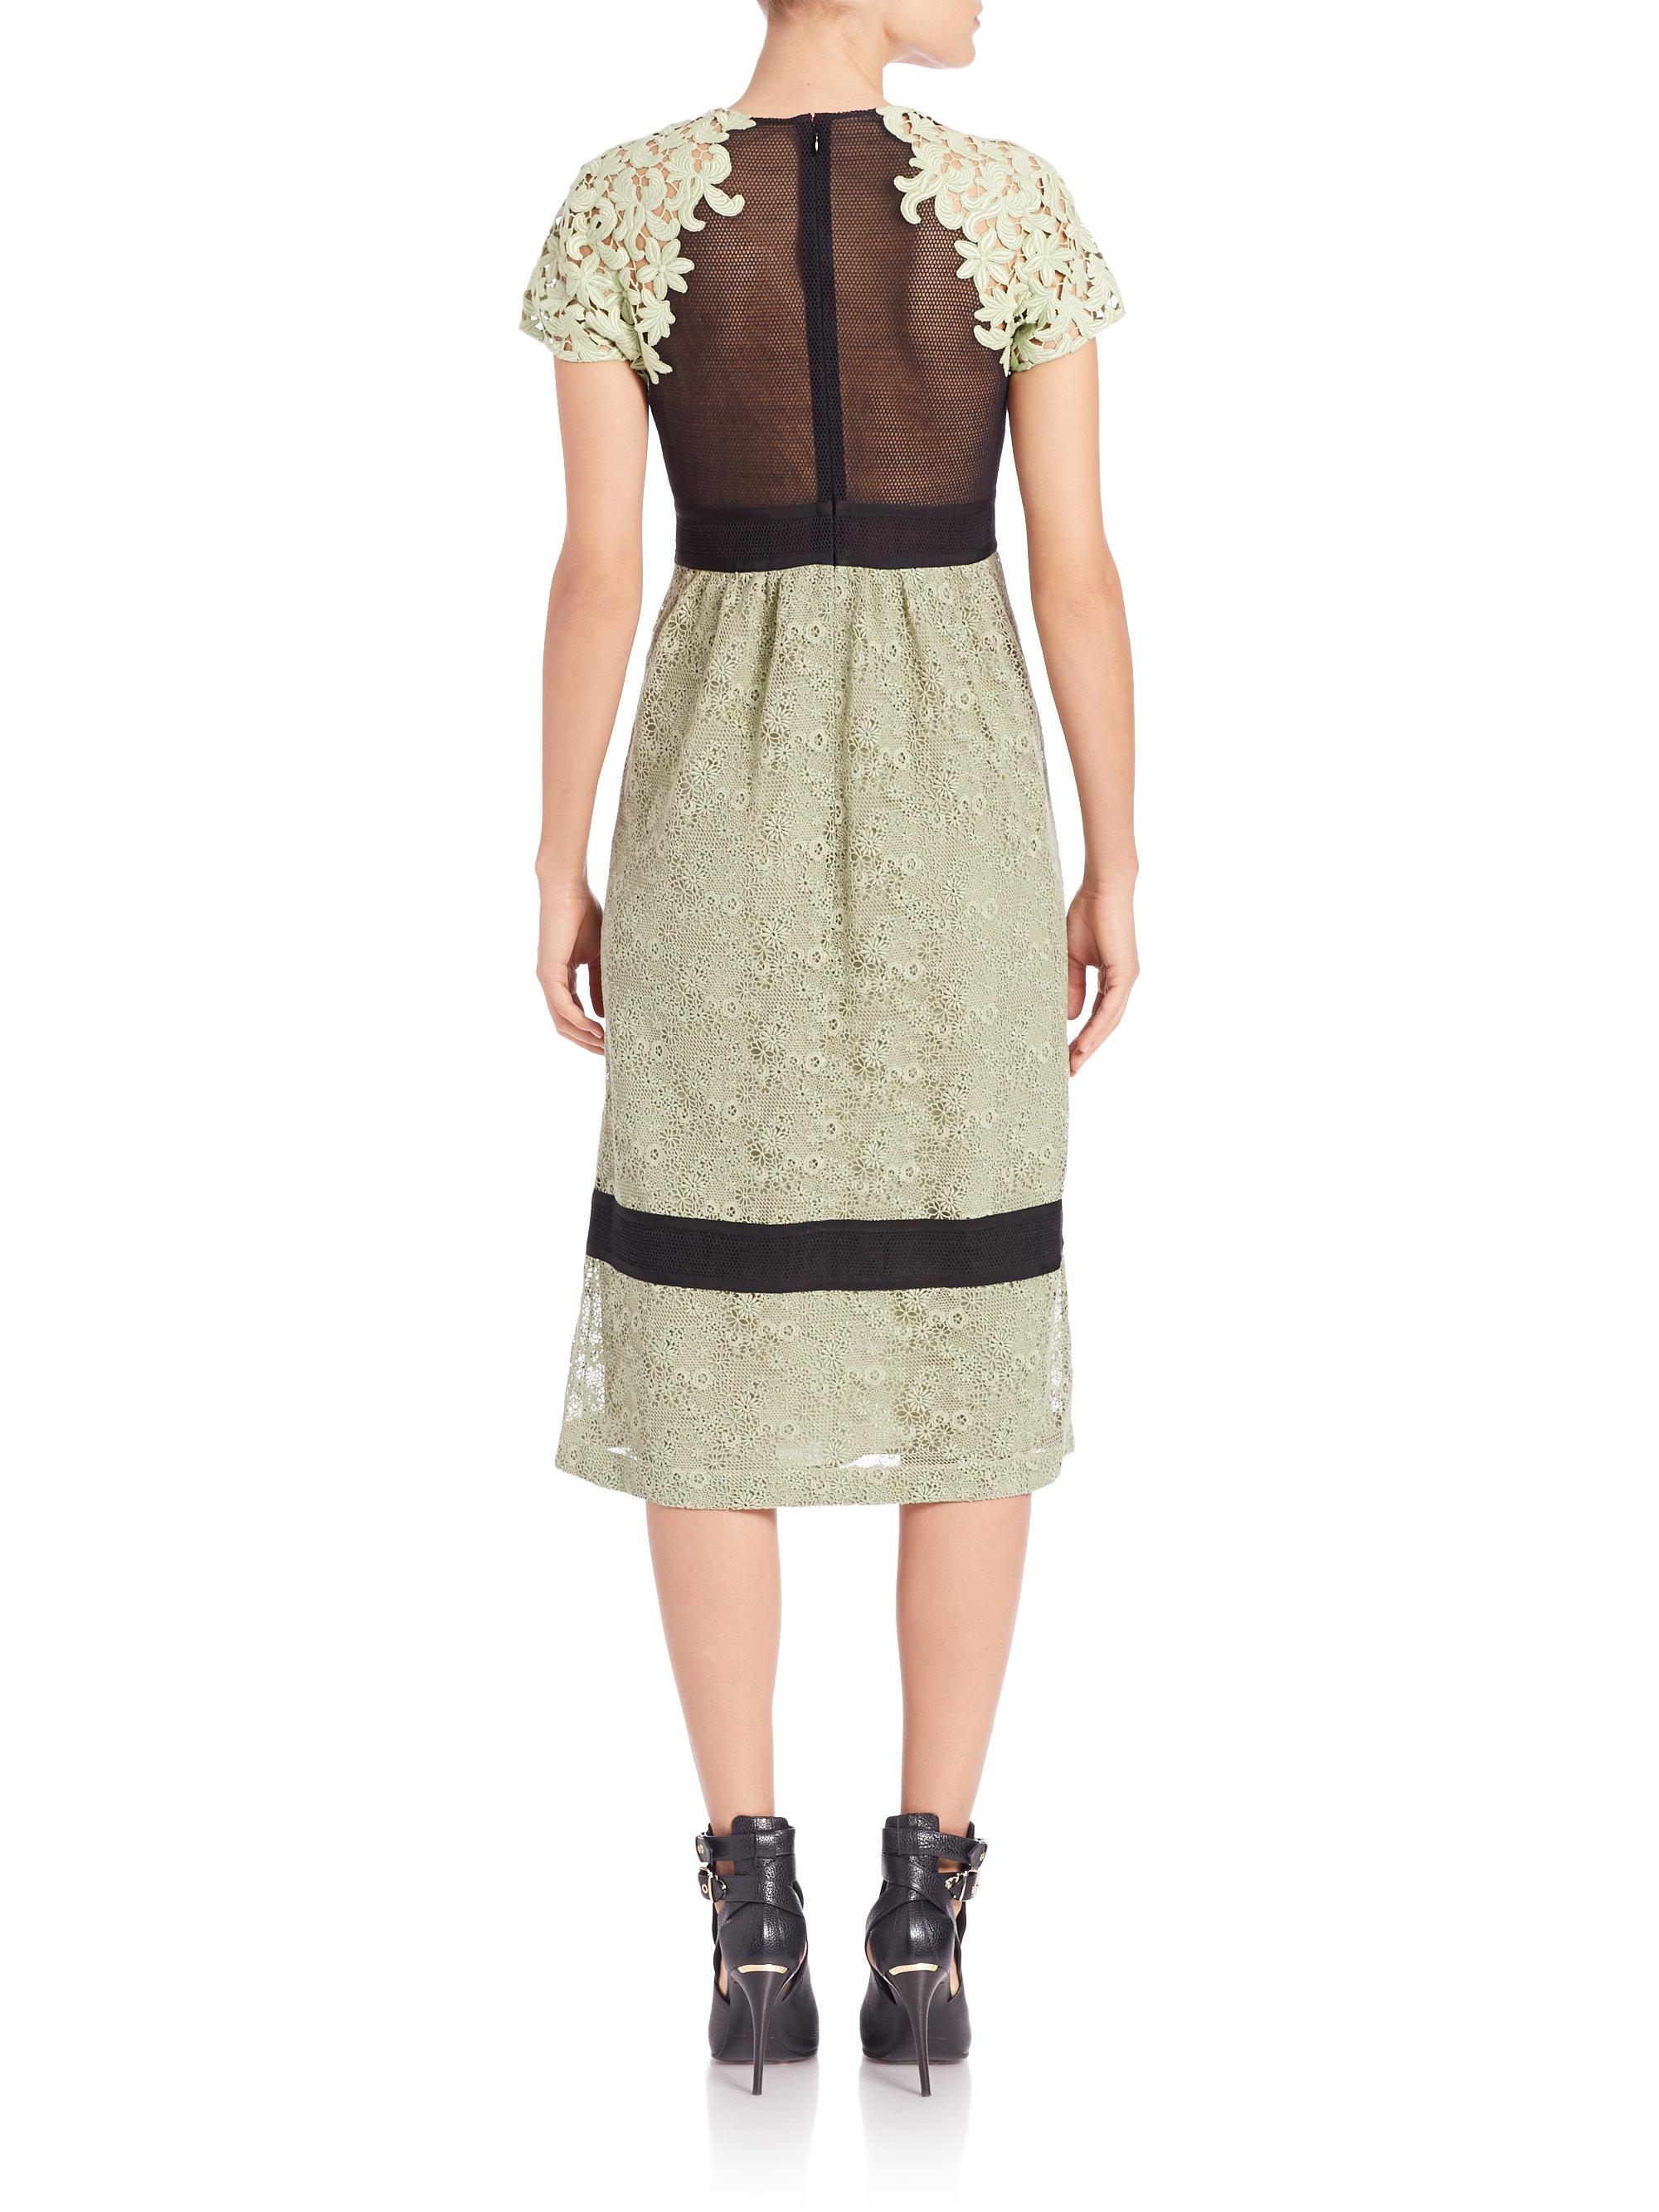 11122a877cc Burberry Prorsum Green Lace Dress